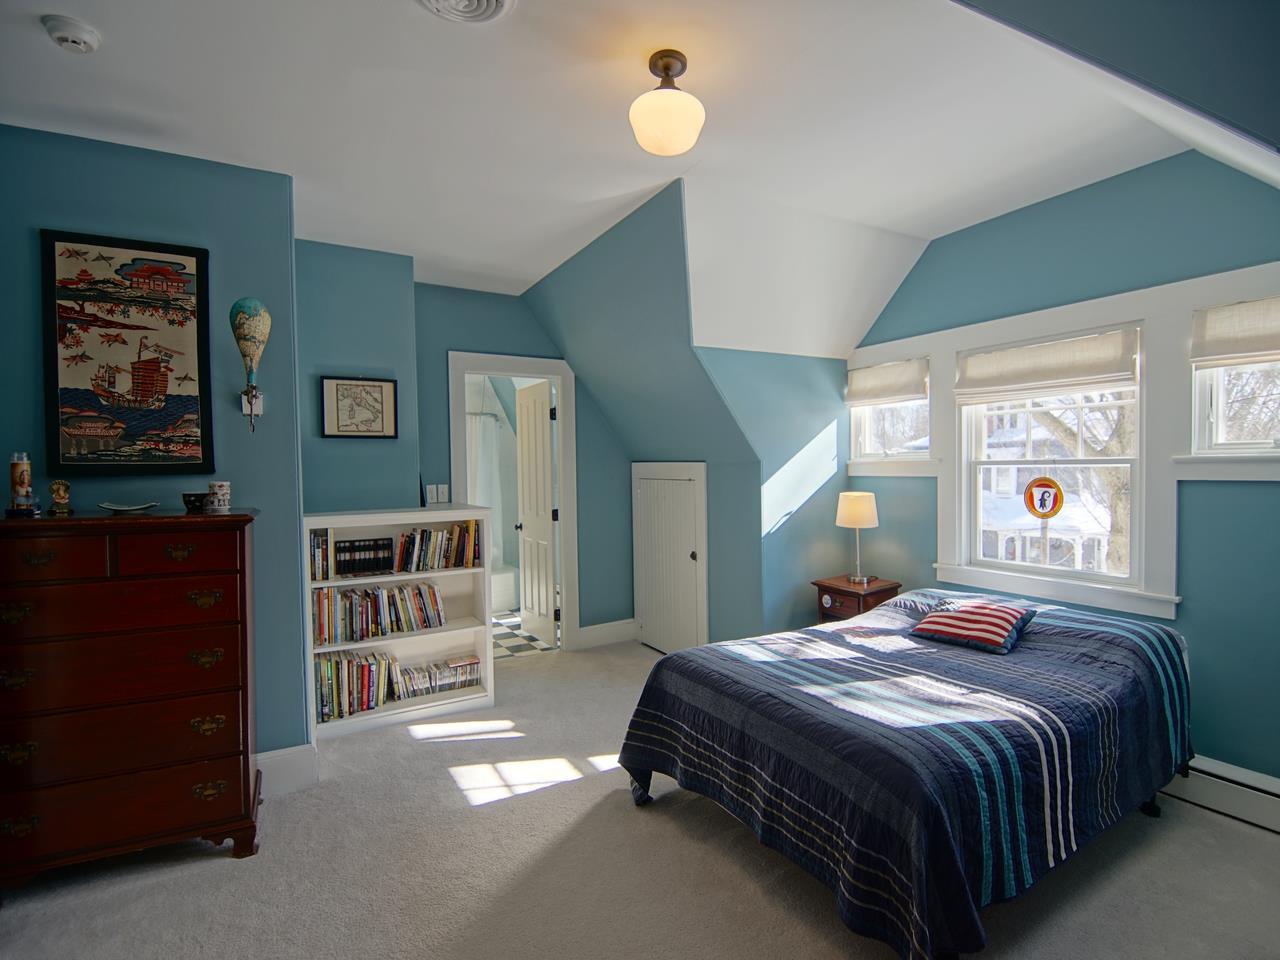 133 Miller Avenue, Portsmouth, NH, - Properties - Joseph Tanner